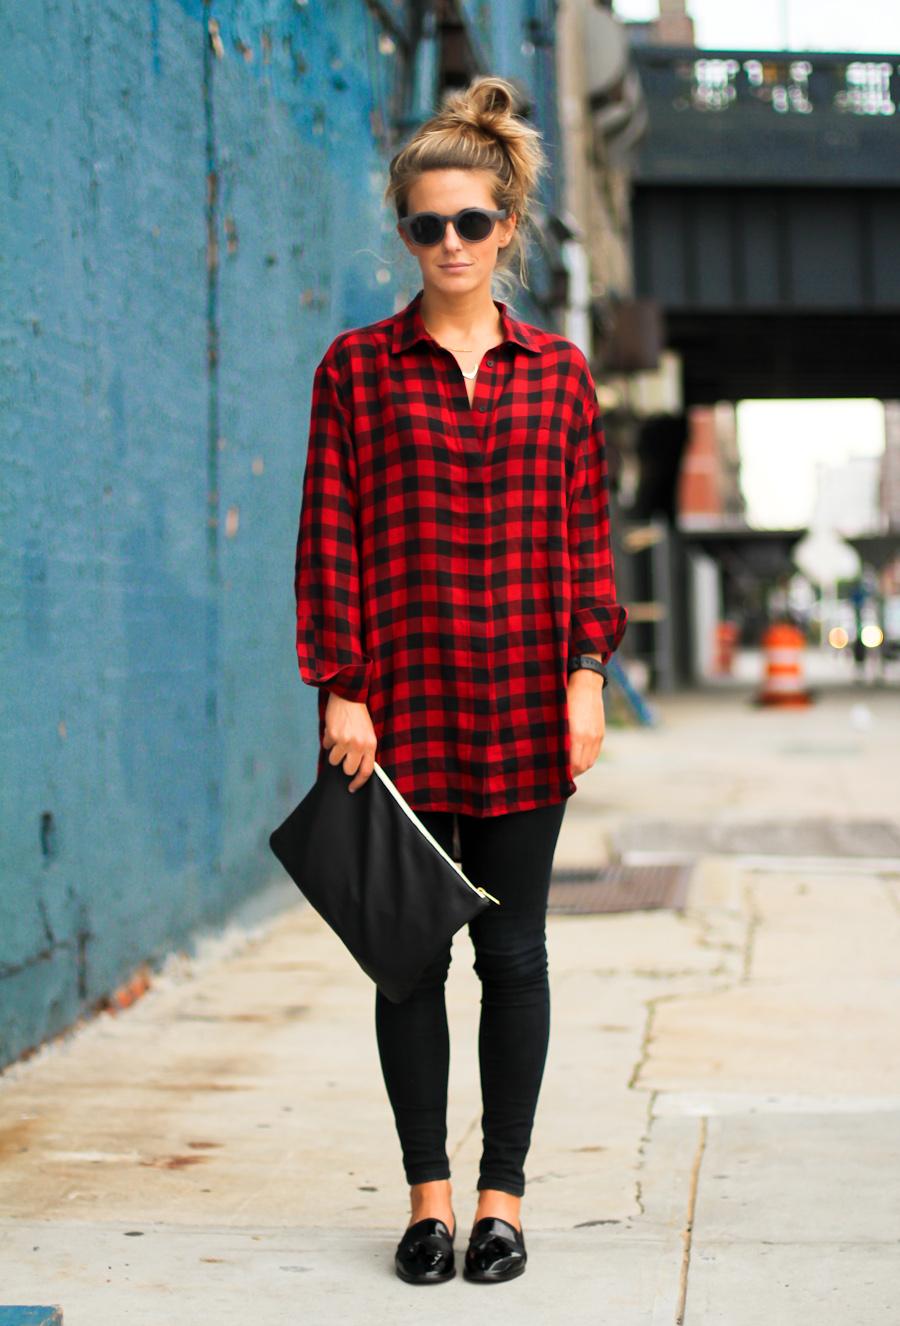 IMG_8267-Clochet red check shirt dress